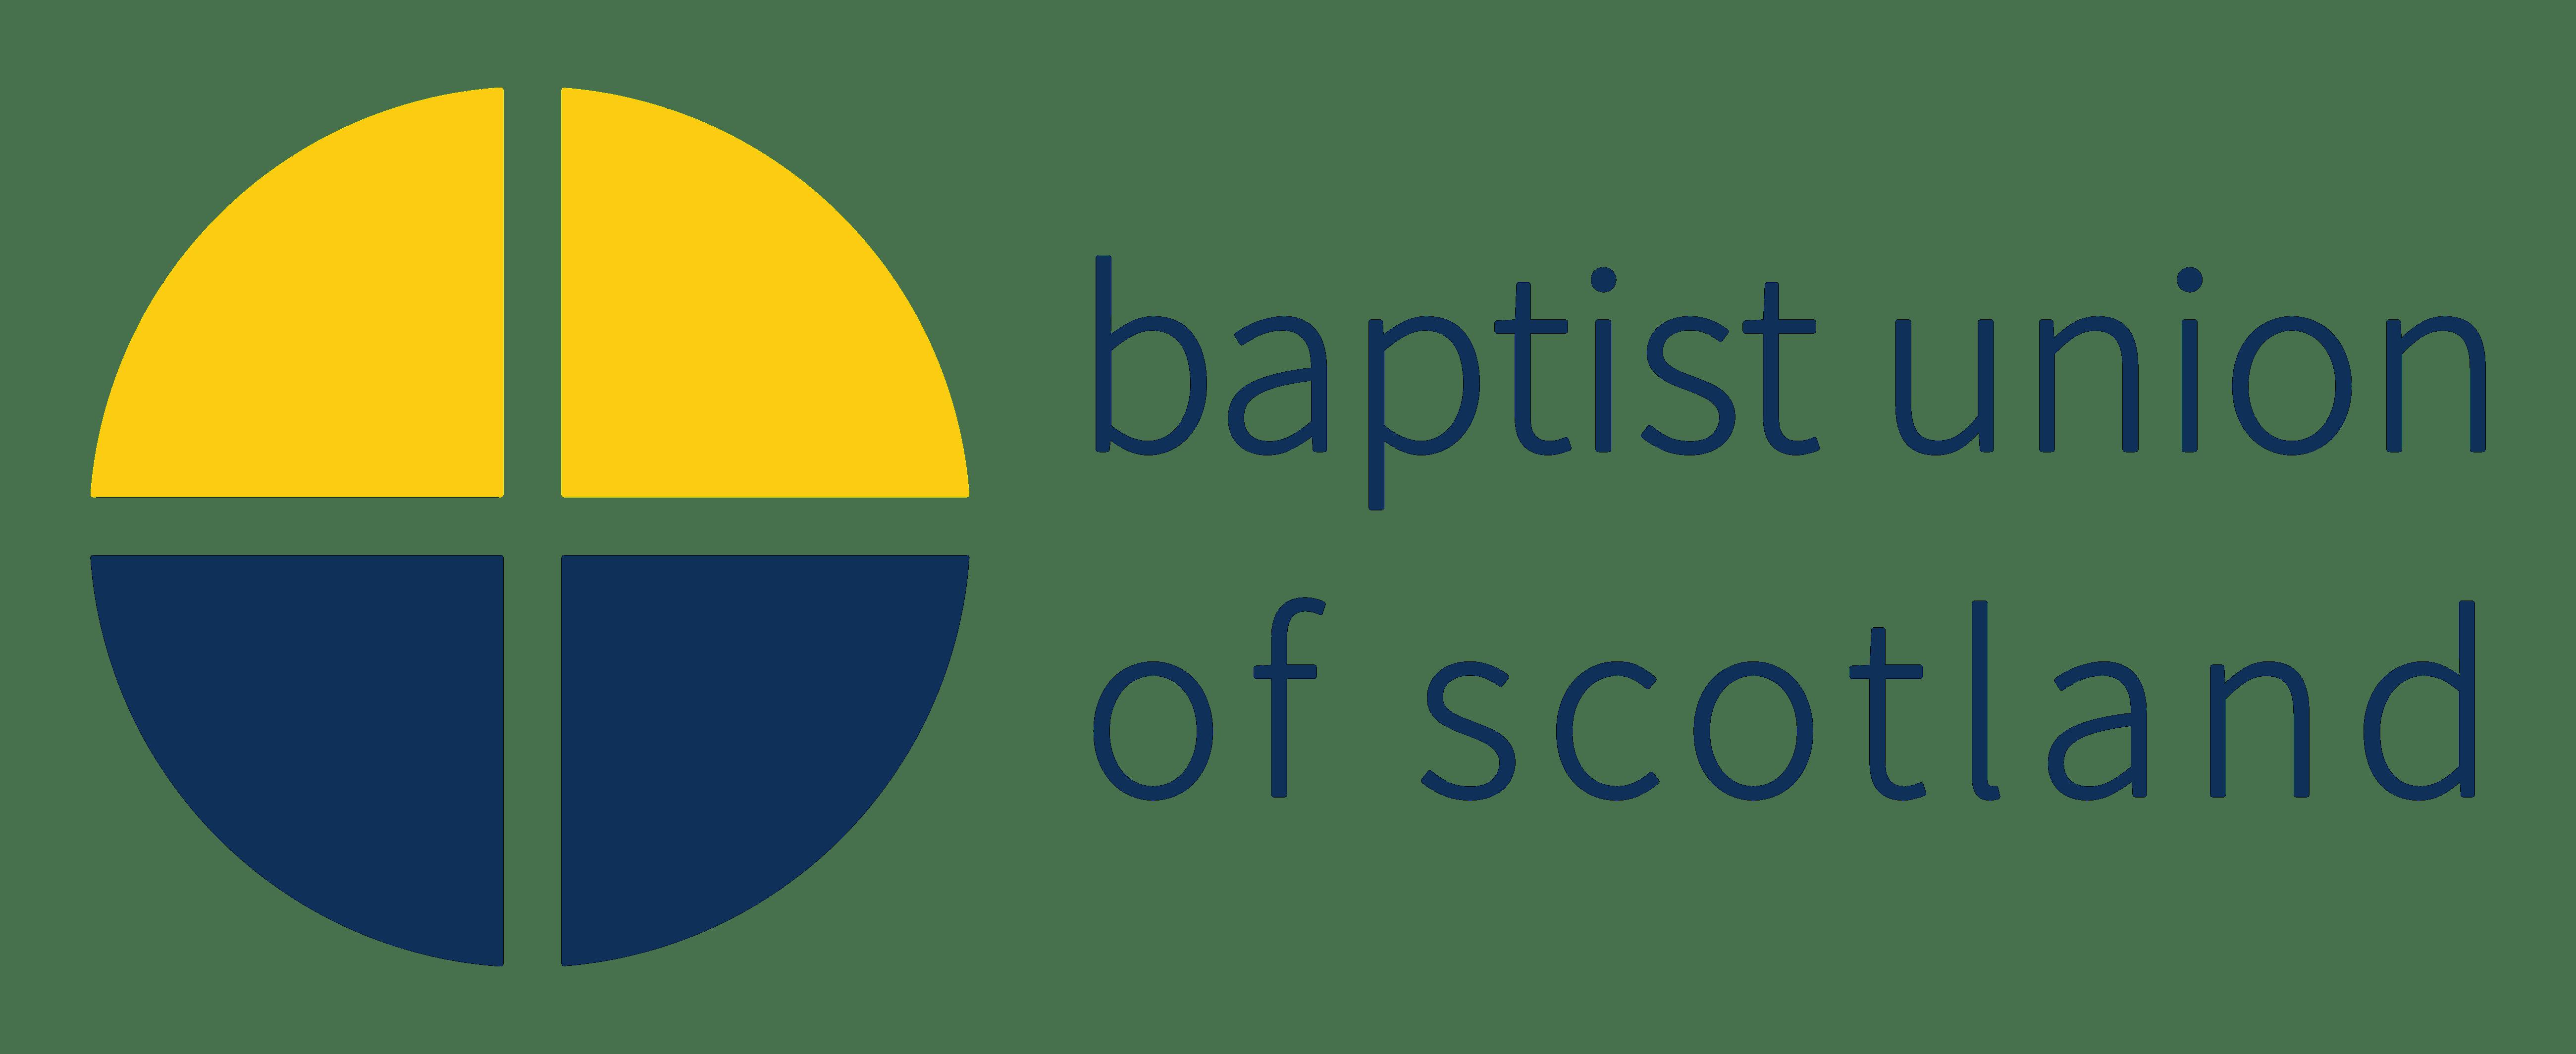 Baptist Union of Scotland logo